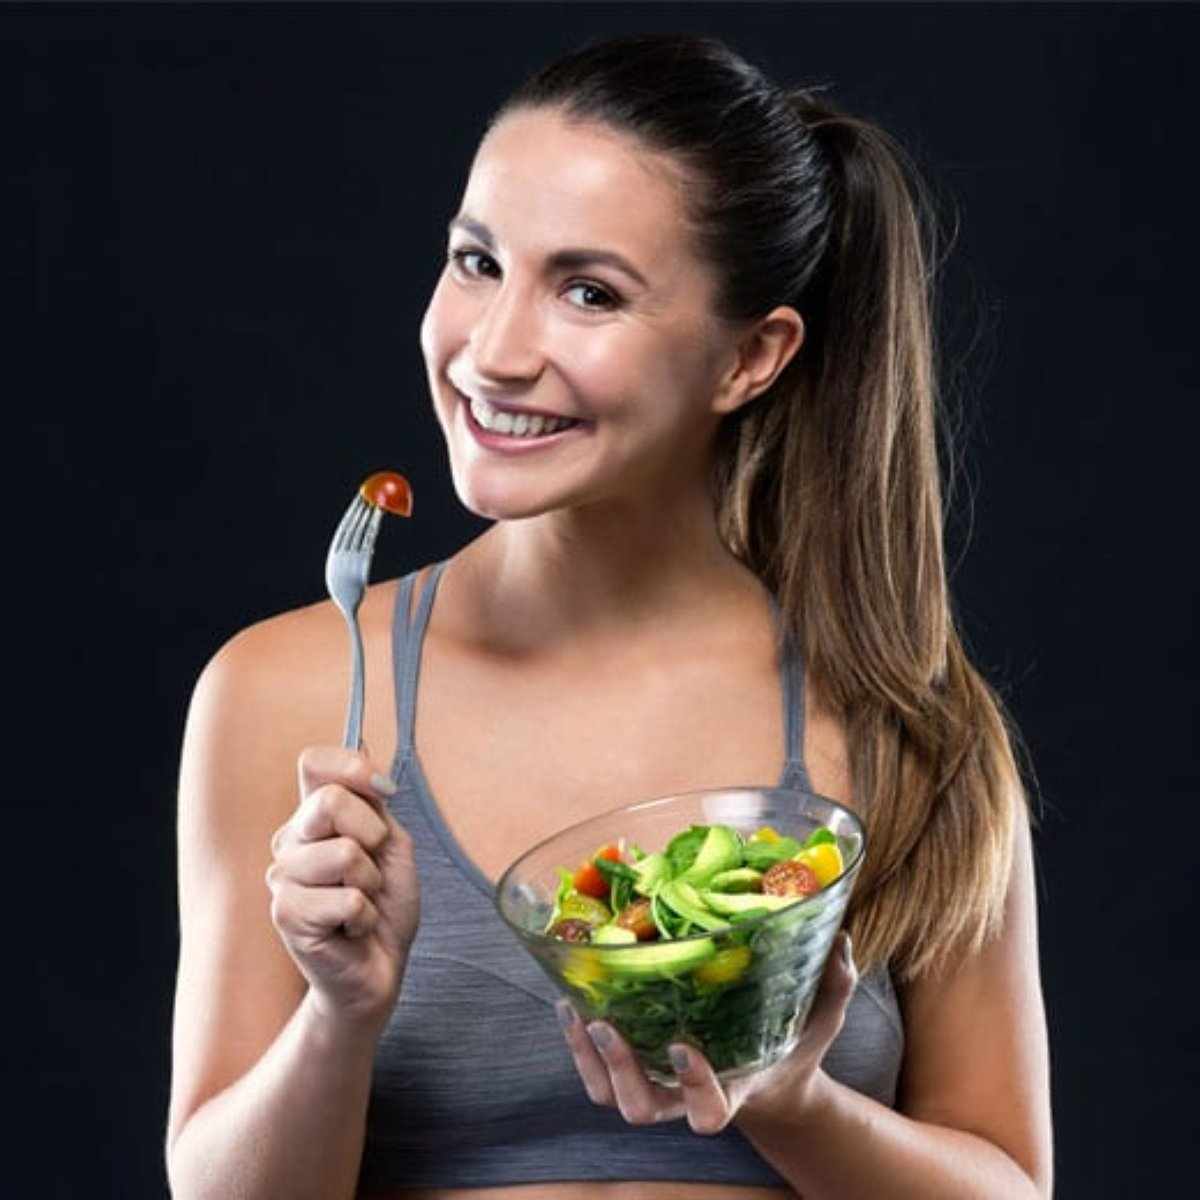 Proteína crescer sem músculo pode